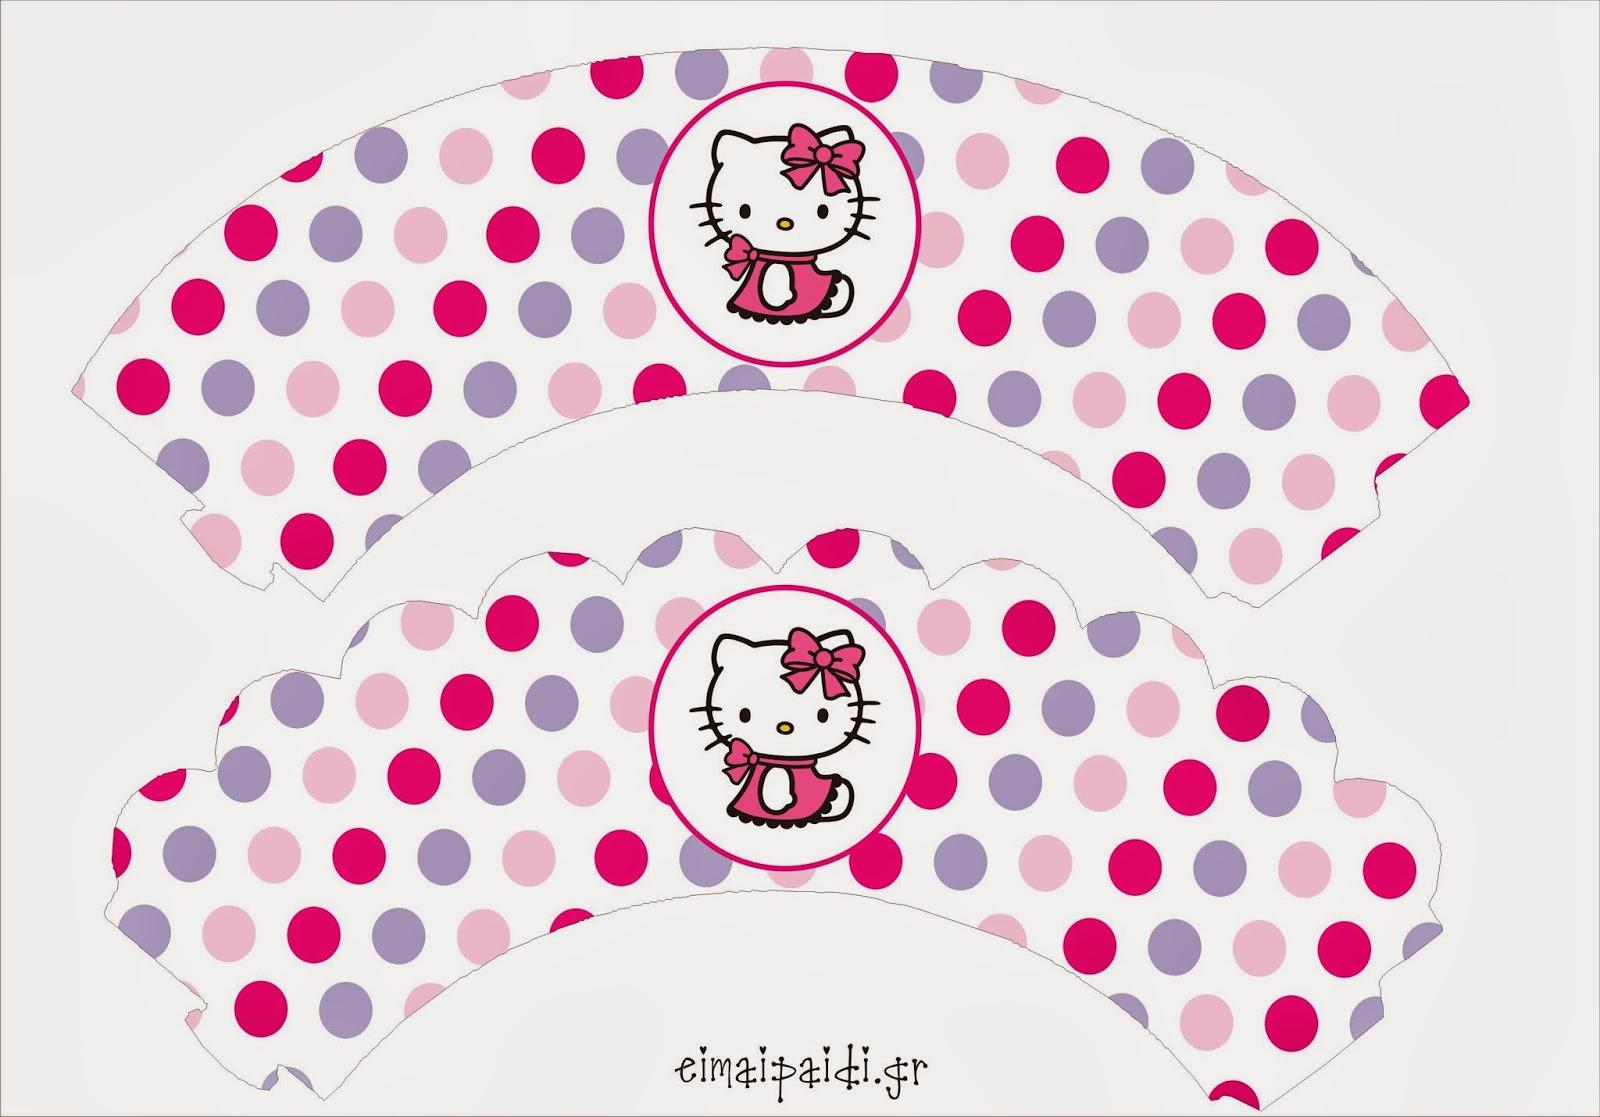 eimaipaidi.gr-cupcakes cover-Hello Kitty-printables